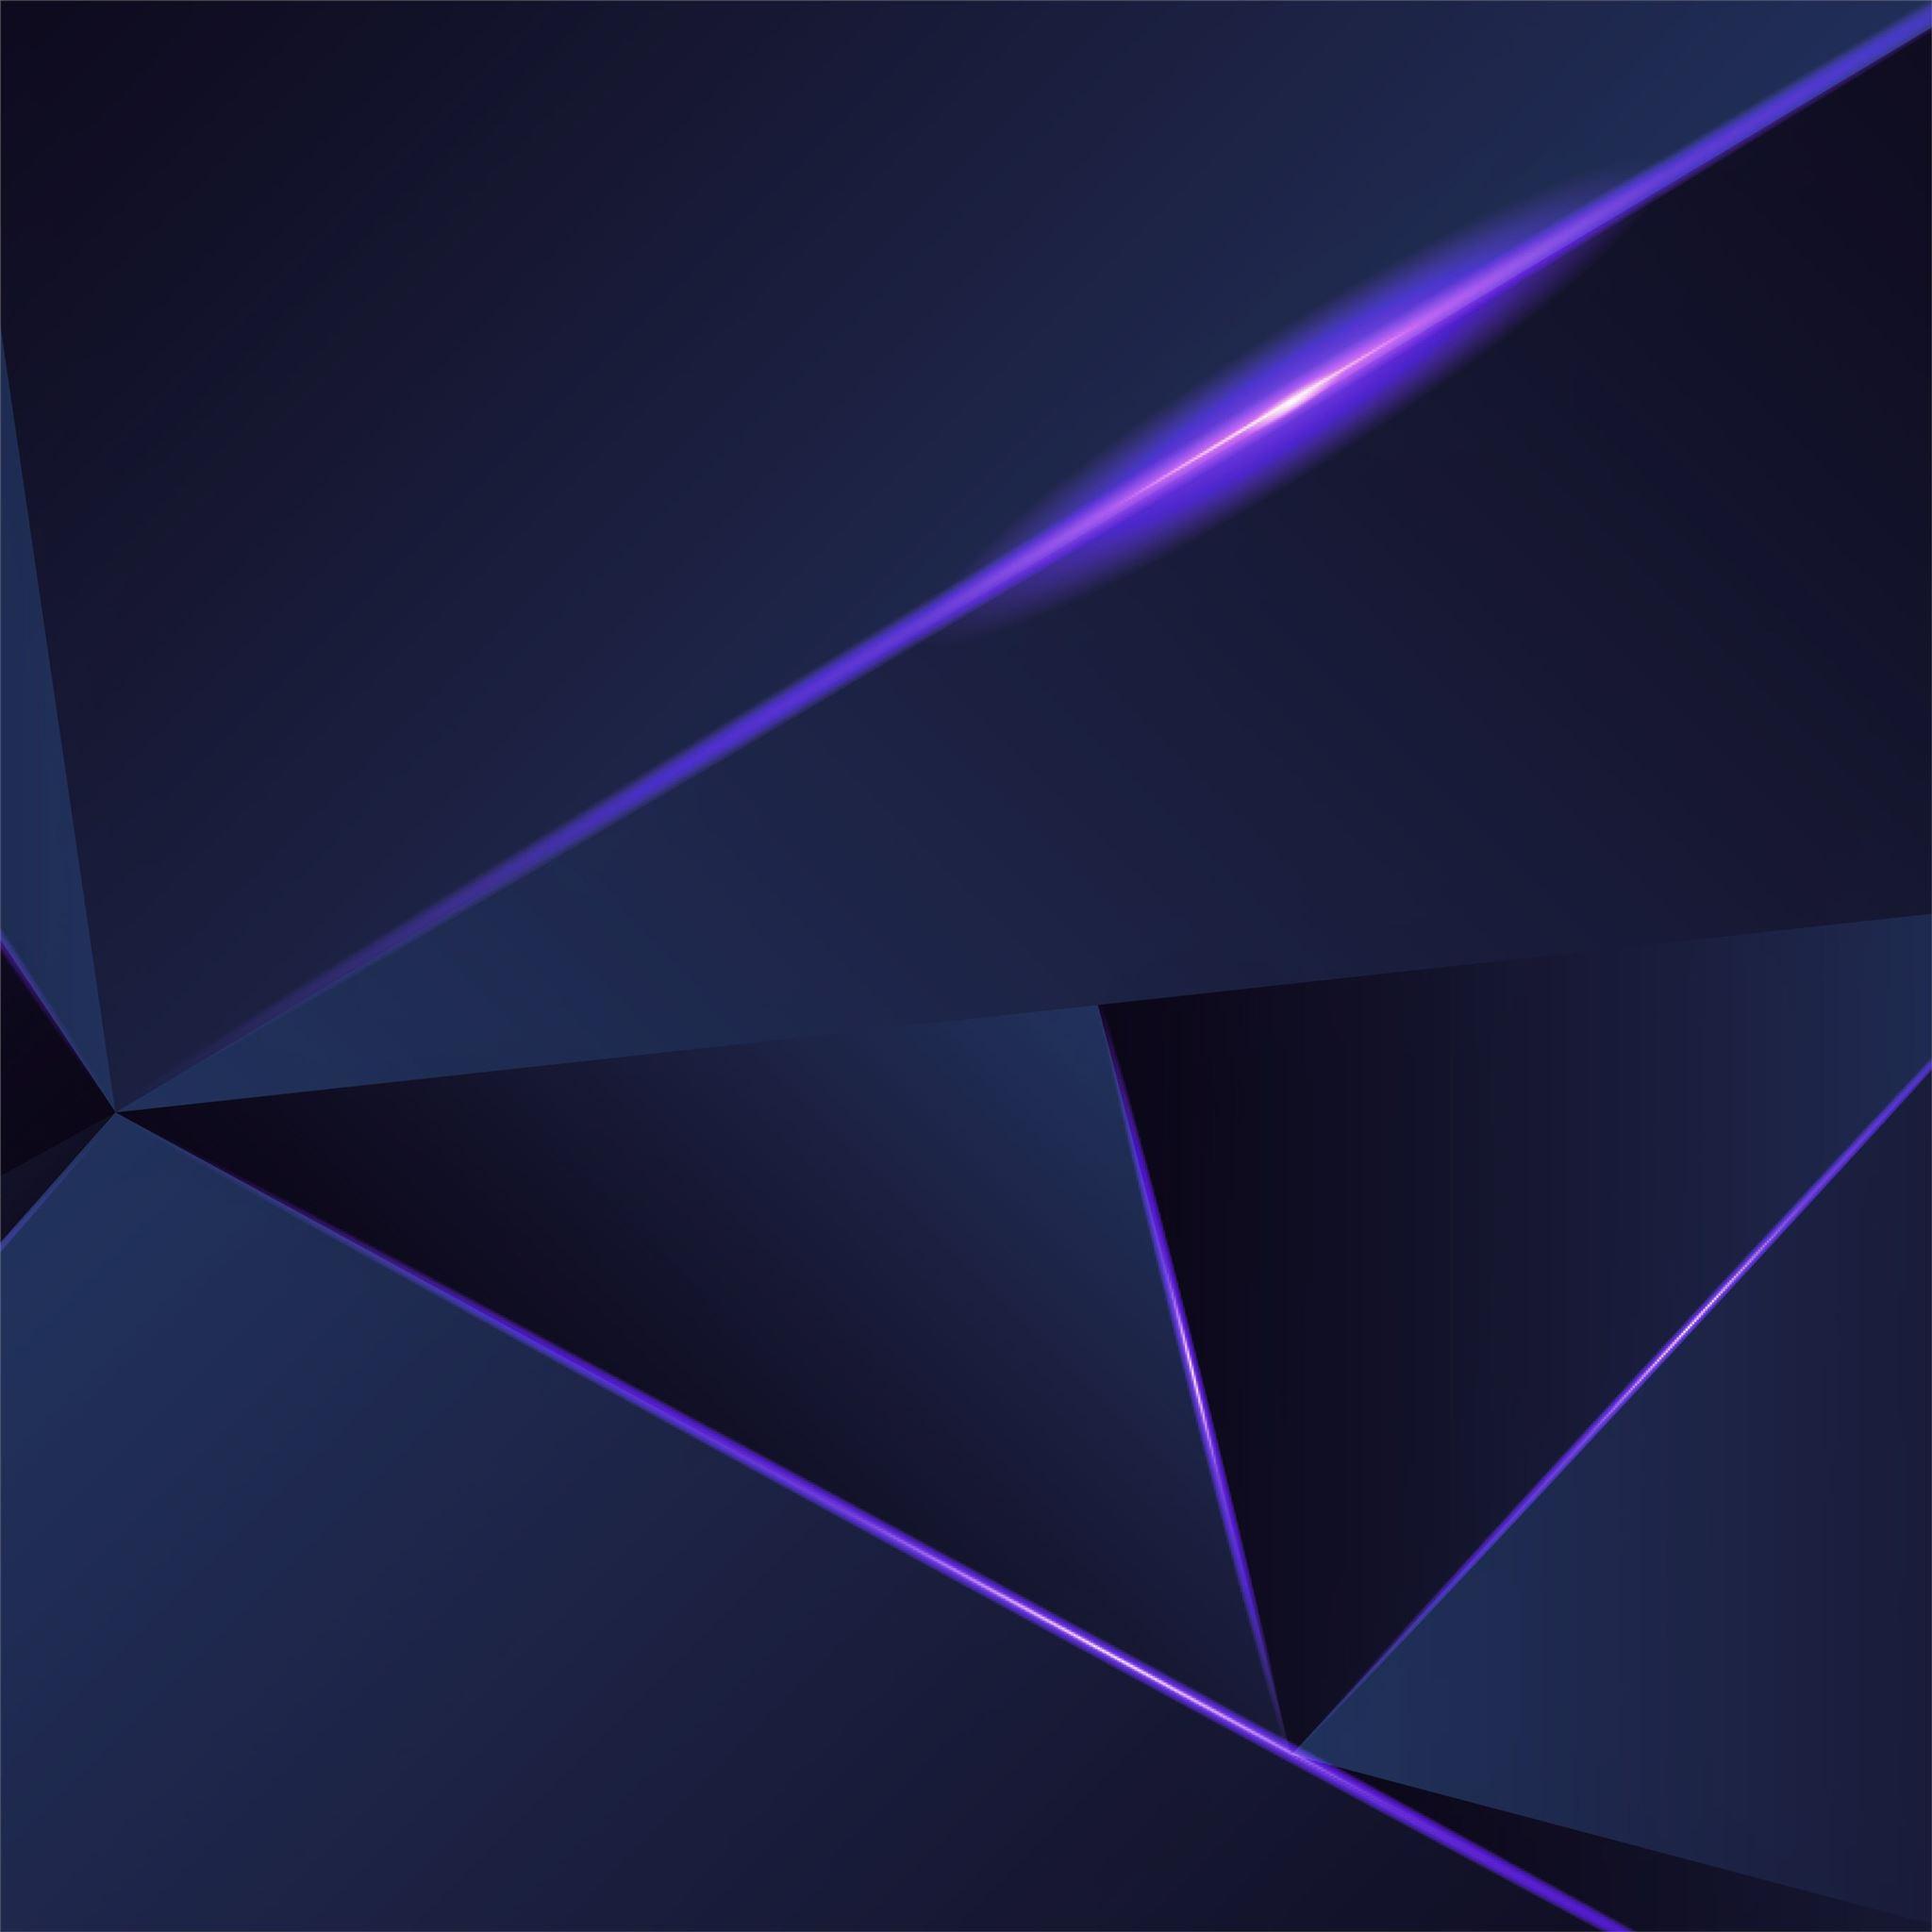 8k Abstract Purple Hint IPad Air Wallpapers Free Download